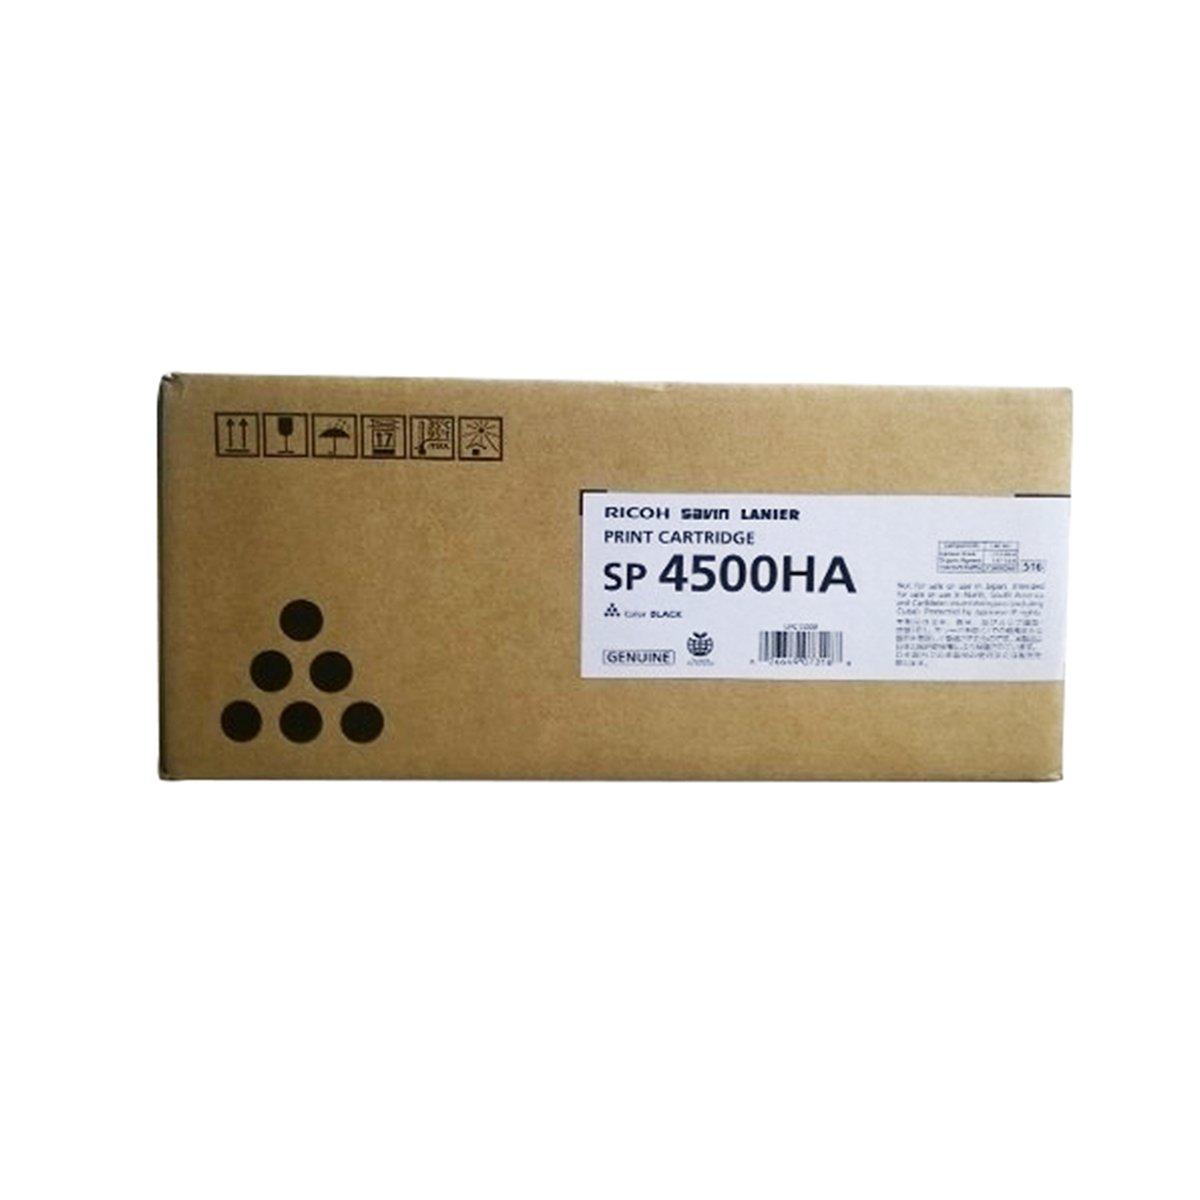 Ricoh High Yield Print Cartridge, 12000 Yield, Type SP 4500HA (407316)